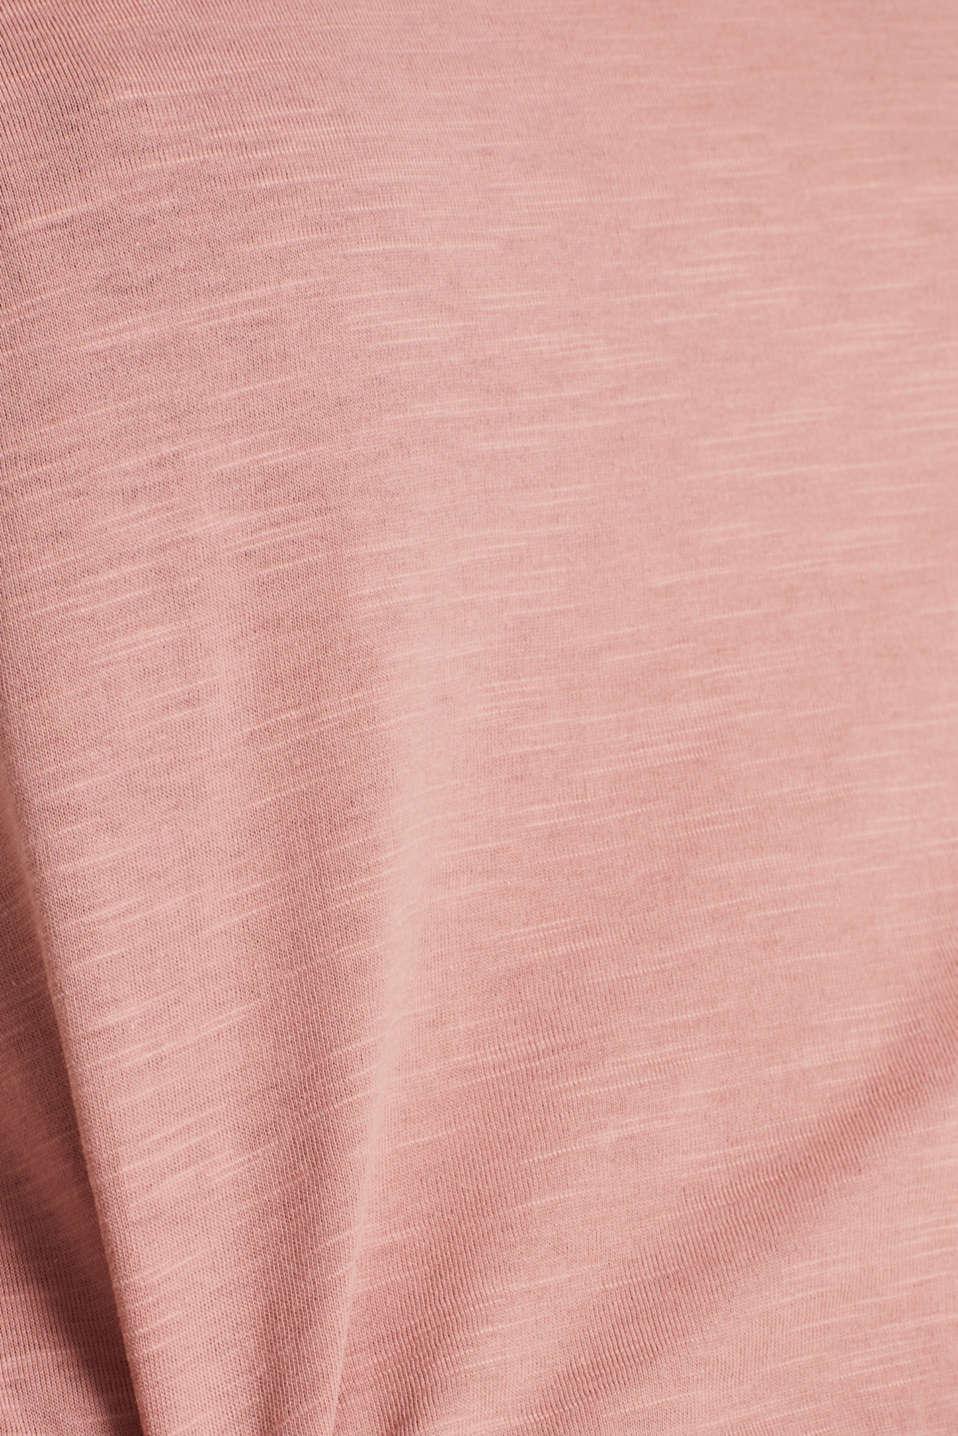 T-Shirts, OLD PINK 3, detail image number 4